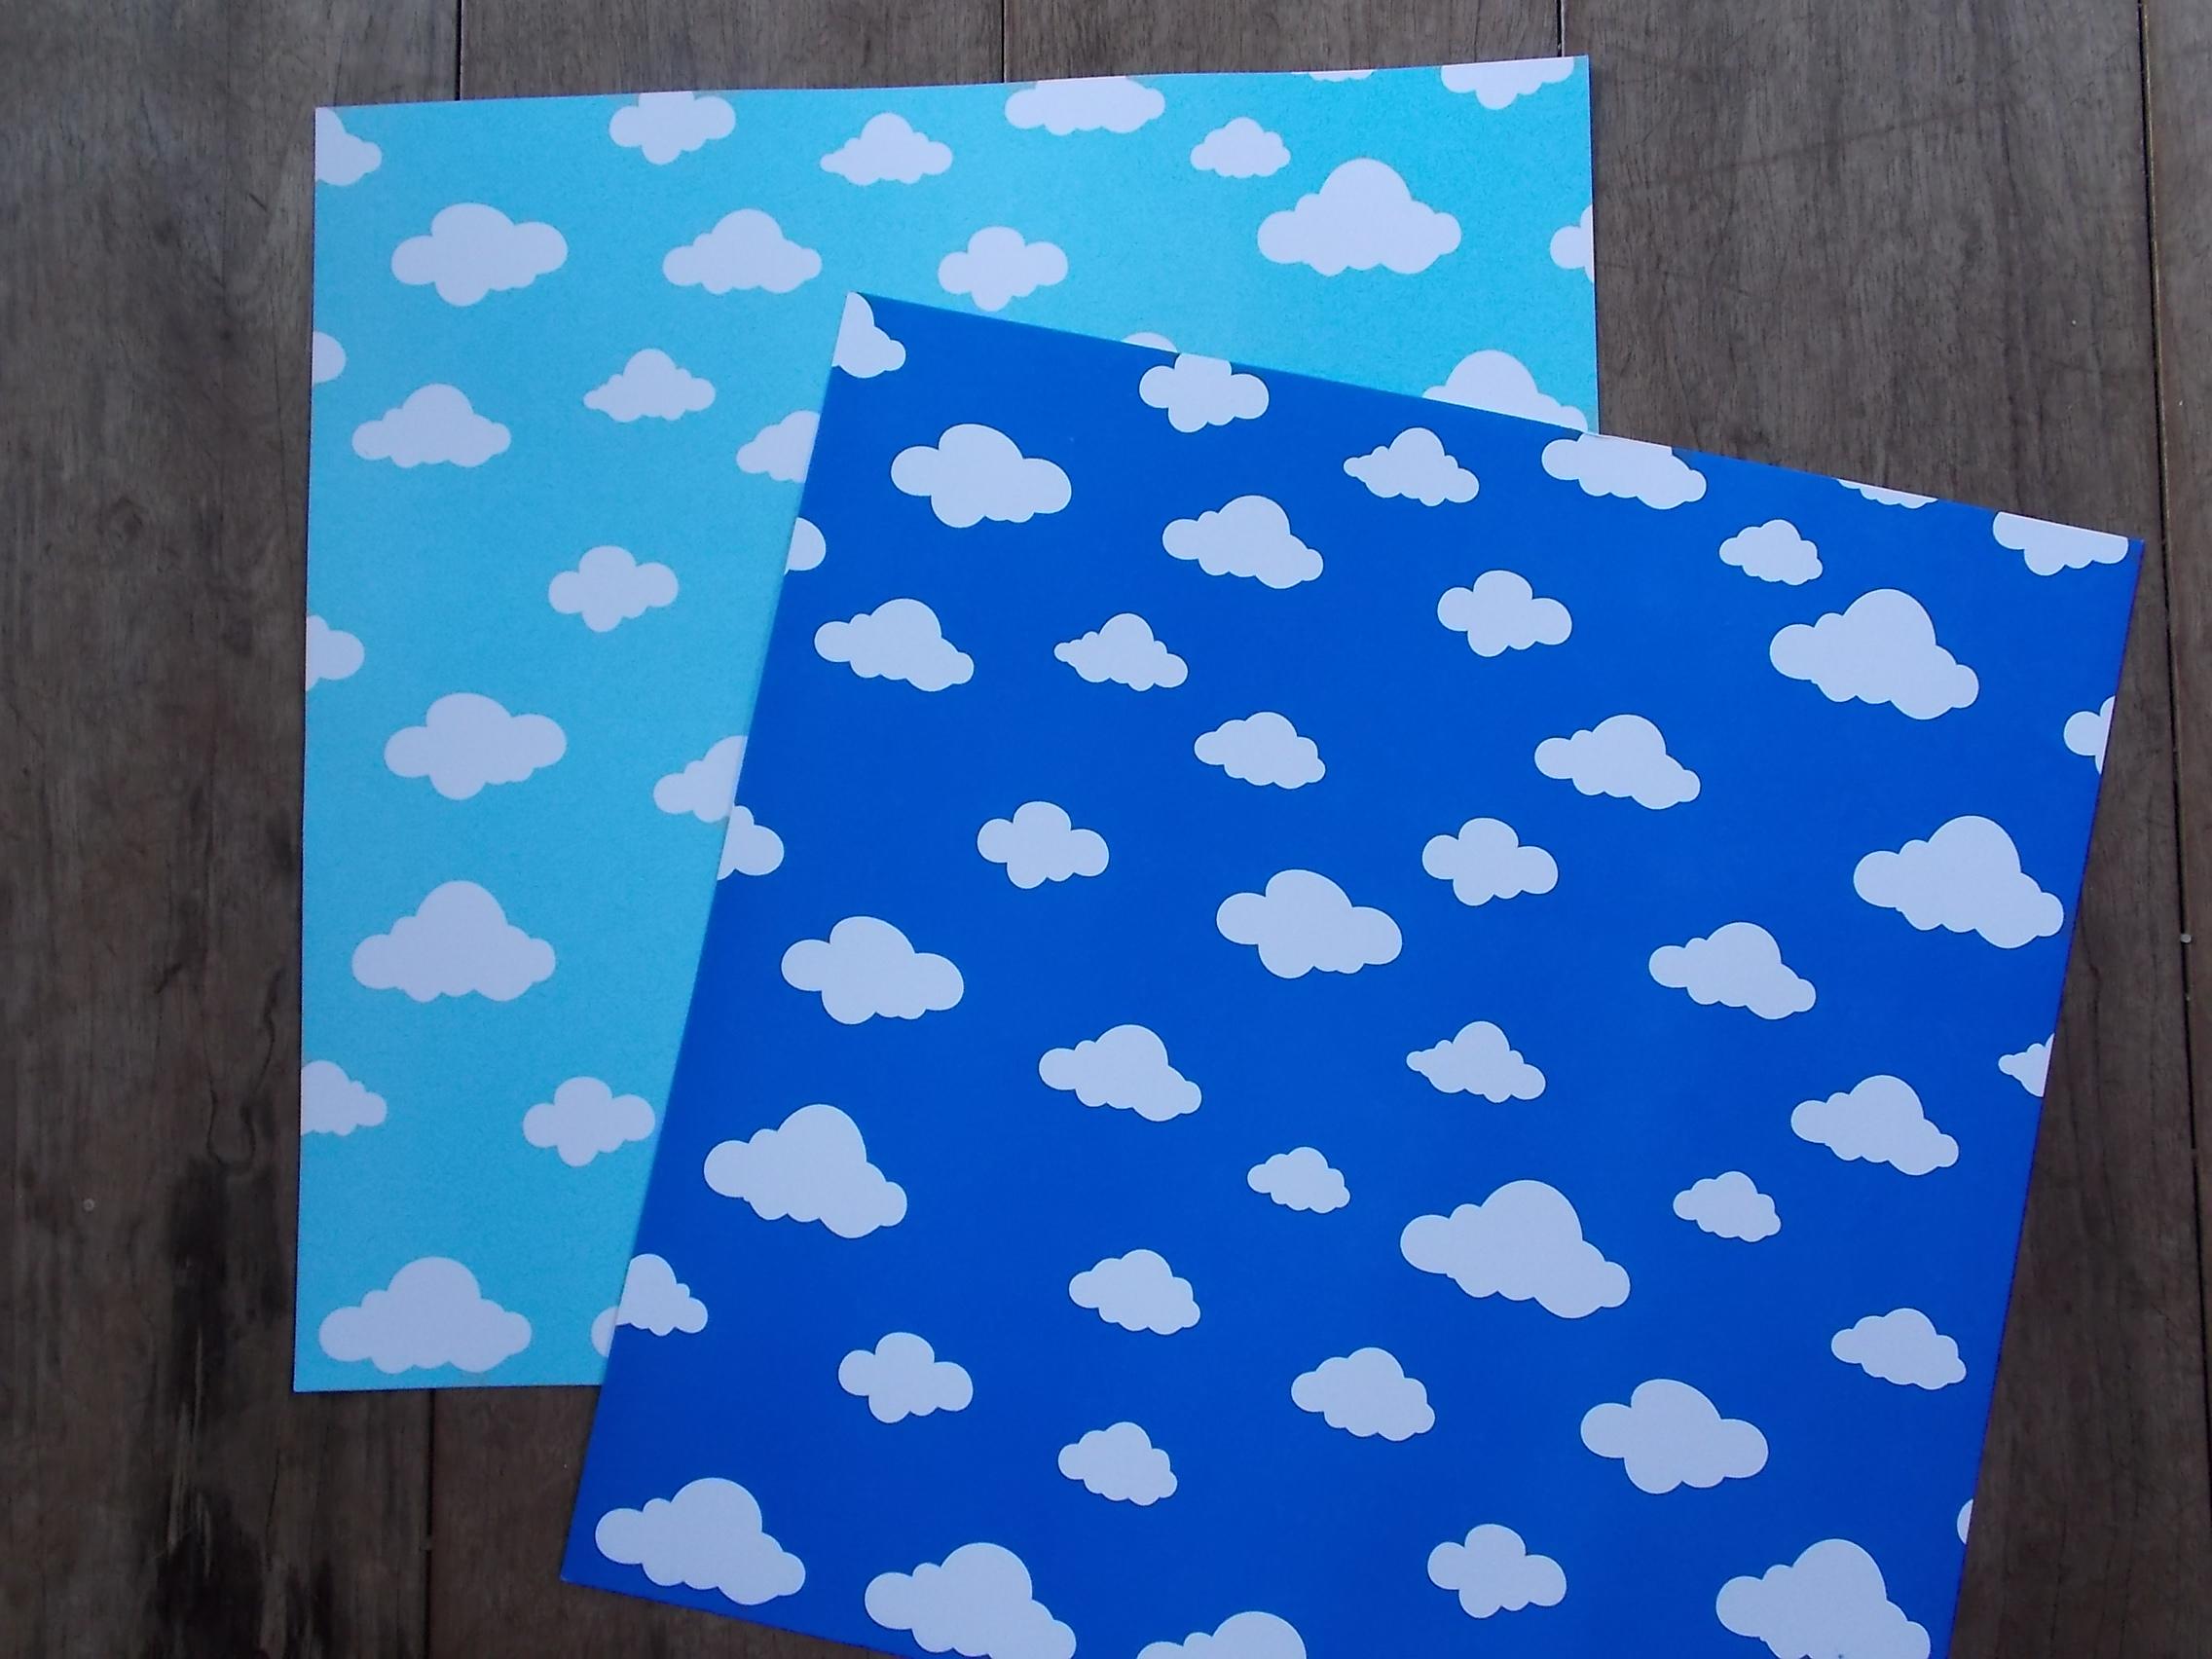 Papel Scrapbook Nuvens Ceu Azul Escuro No Elo7 Graciana